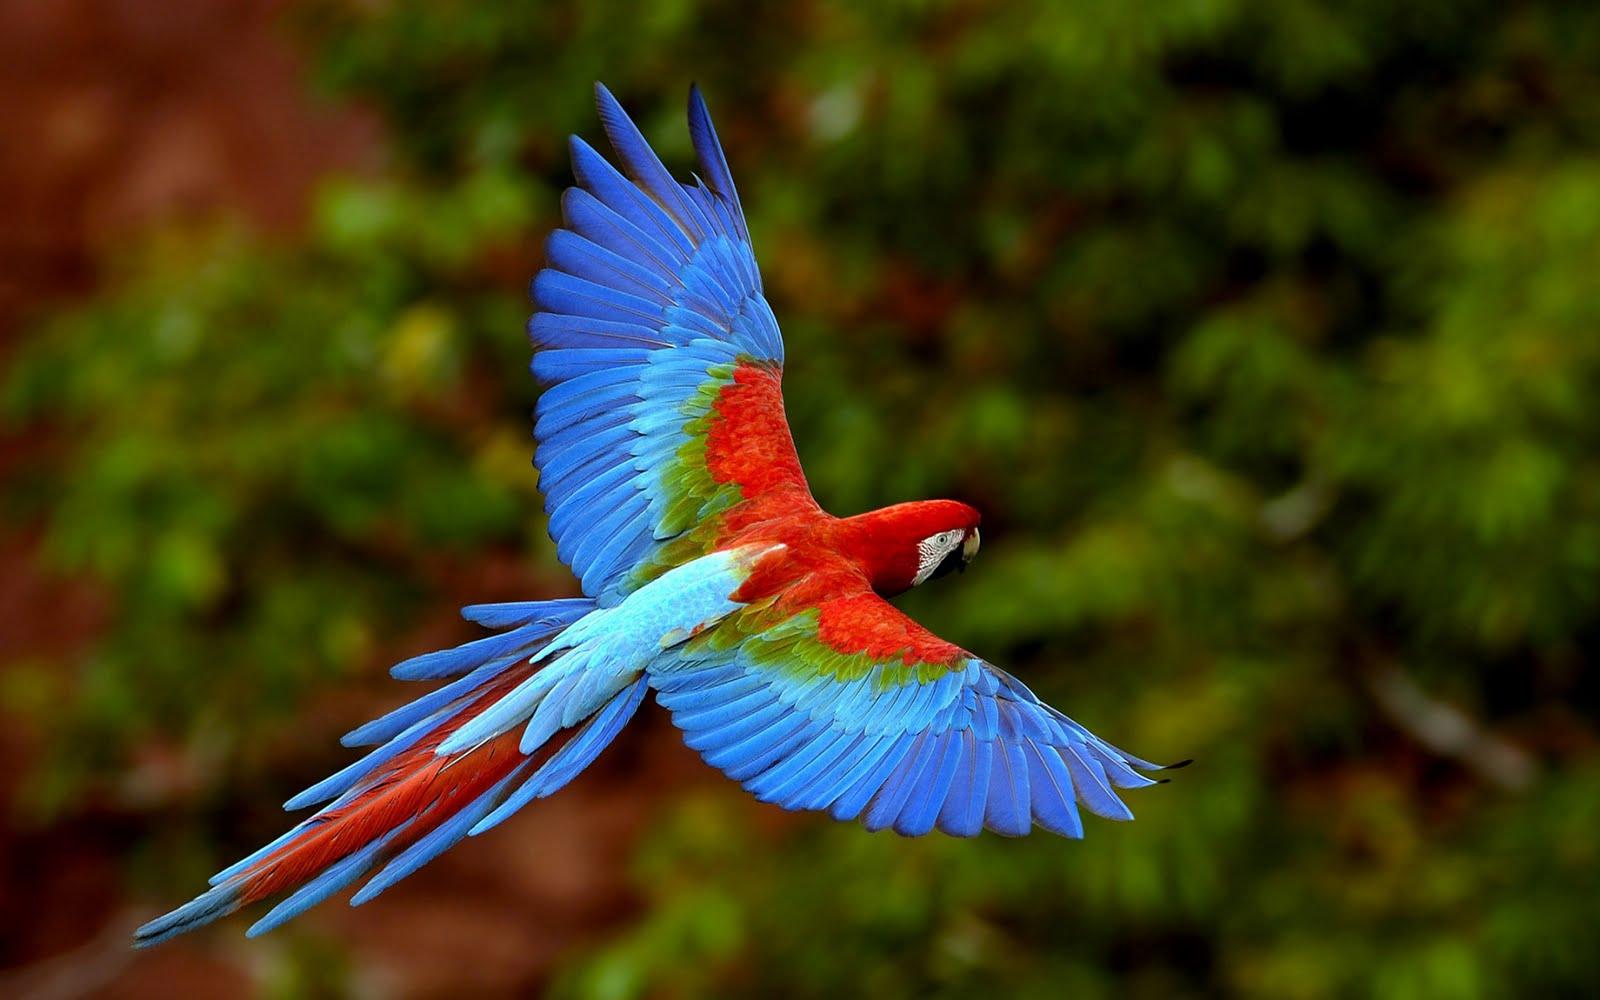 http://2.bp.blogspot.com/_lh4qH1cW0XQ/TVLEA1-ayiI/AAAAAAAAC2c/PzZ1cnL9nyc/s1600/exotic%20flying%20bird.jpg